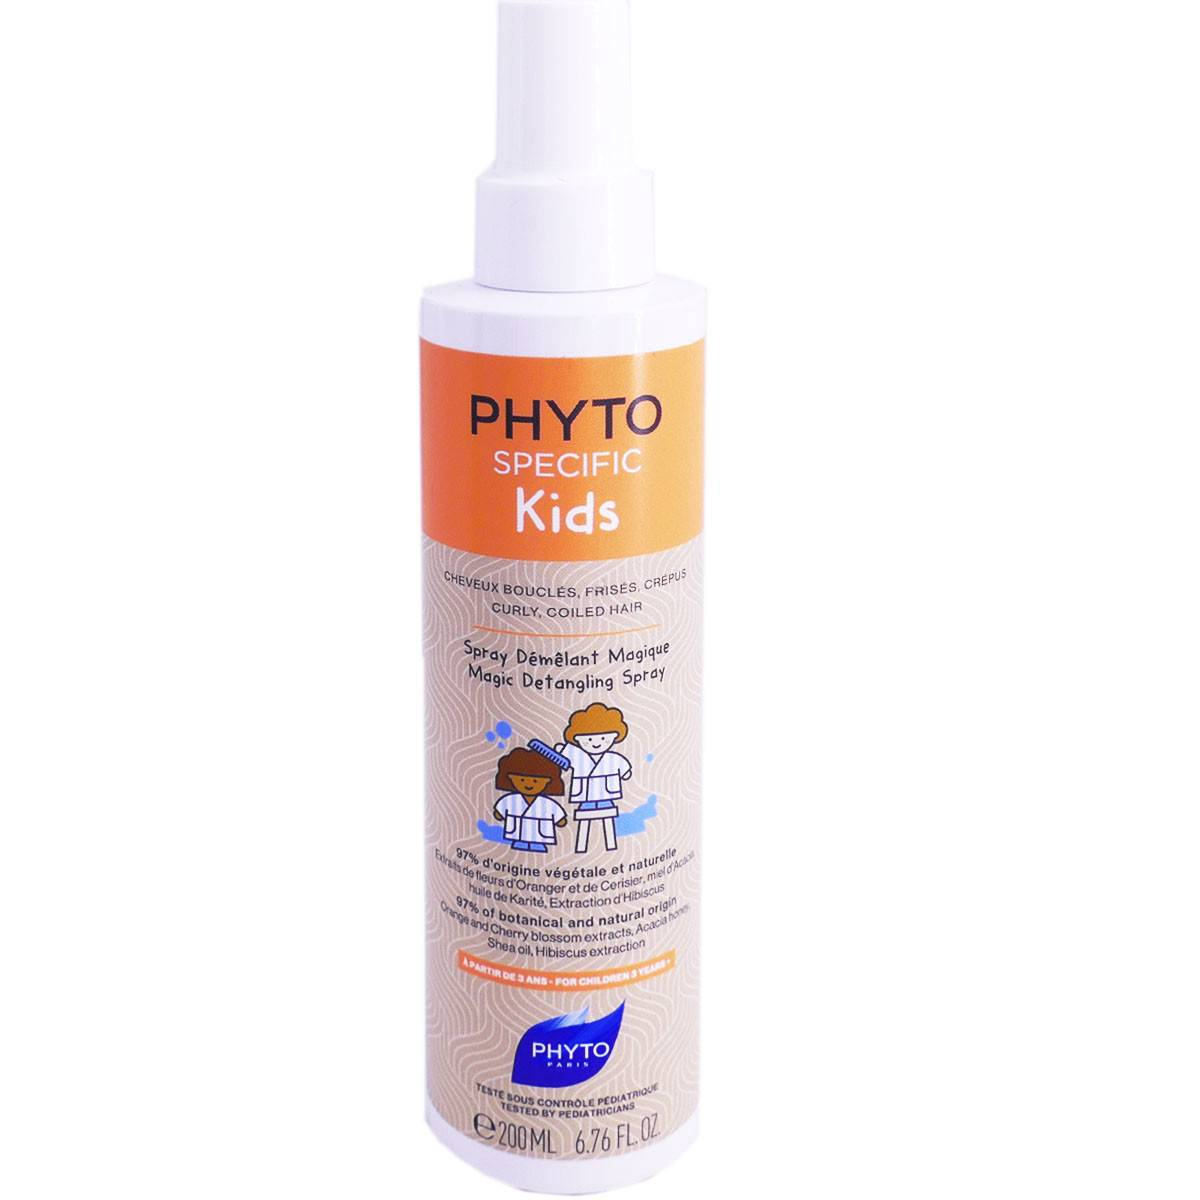 PHYTOSOLBA Phyto specific kids spray demelant magique 200ml